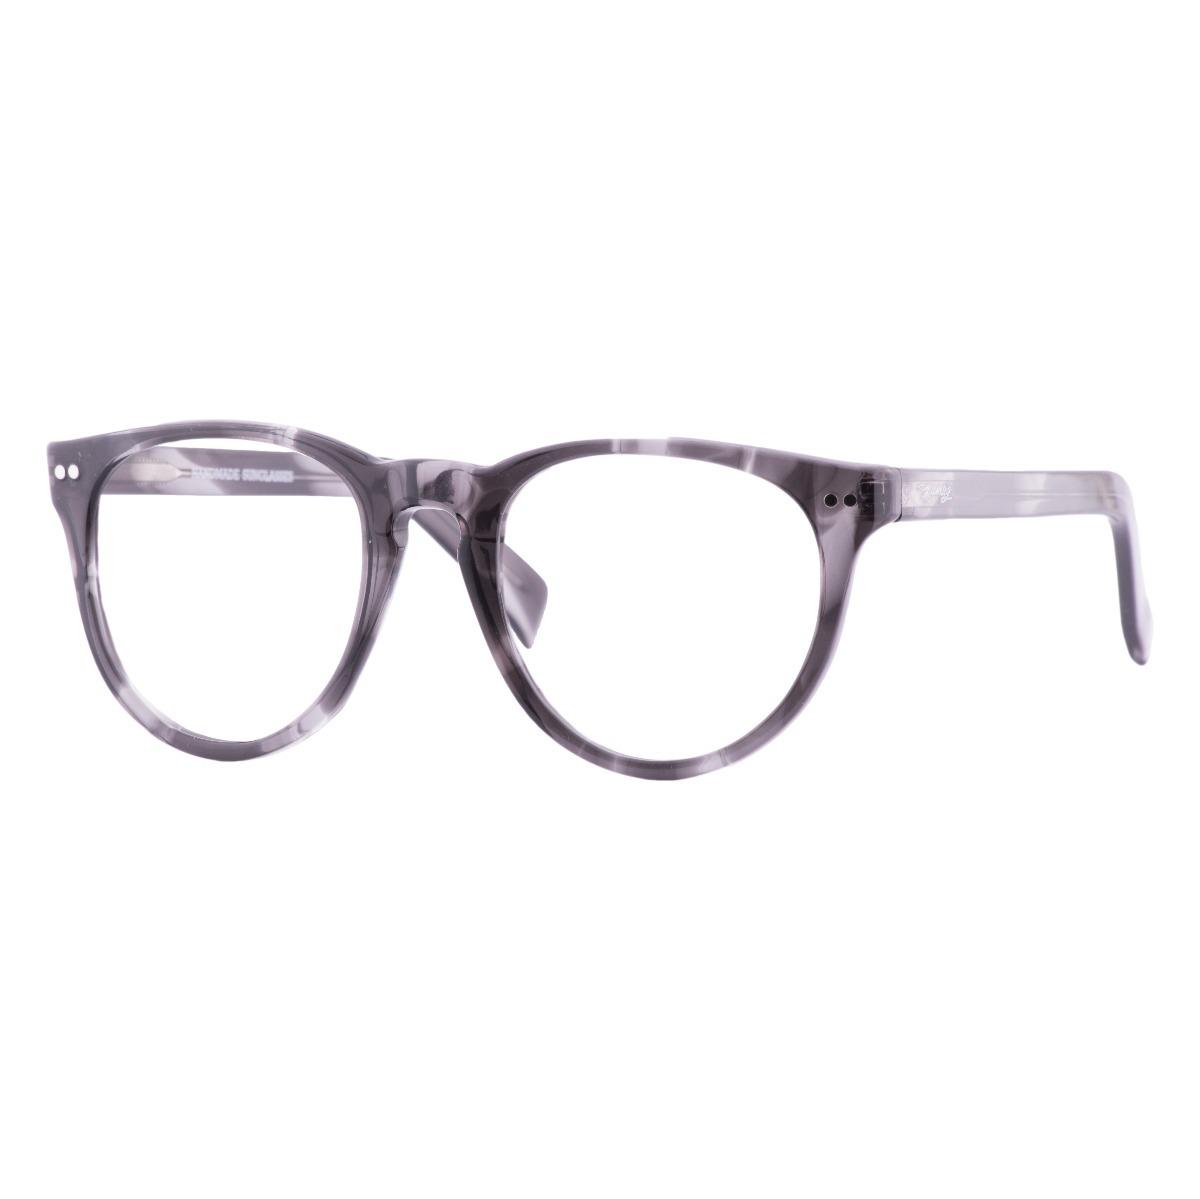 6d350af2b2399 Marcos de anteojos lentes recetados armazones numag kate cargando zoom jpg  1200x1199 Armazones modernos marcos para